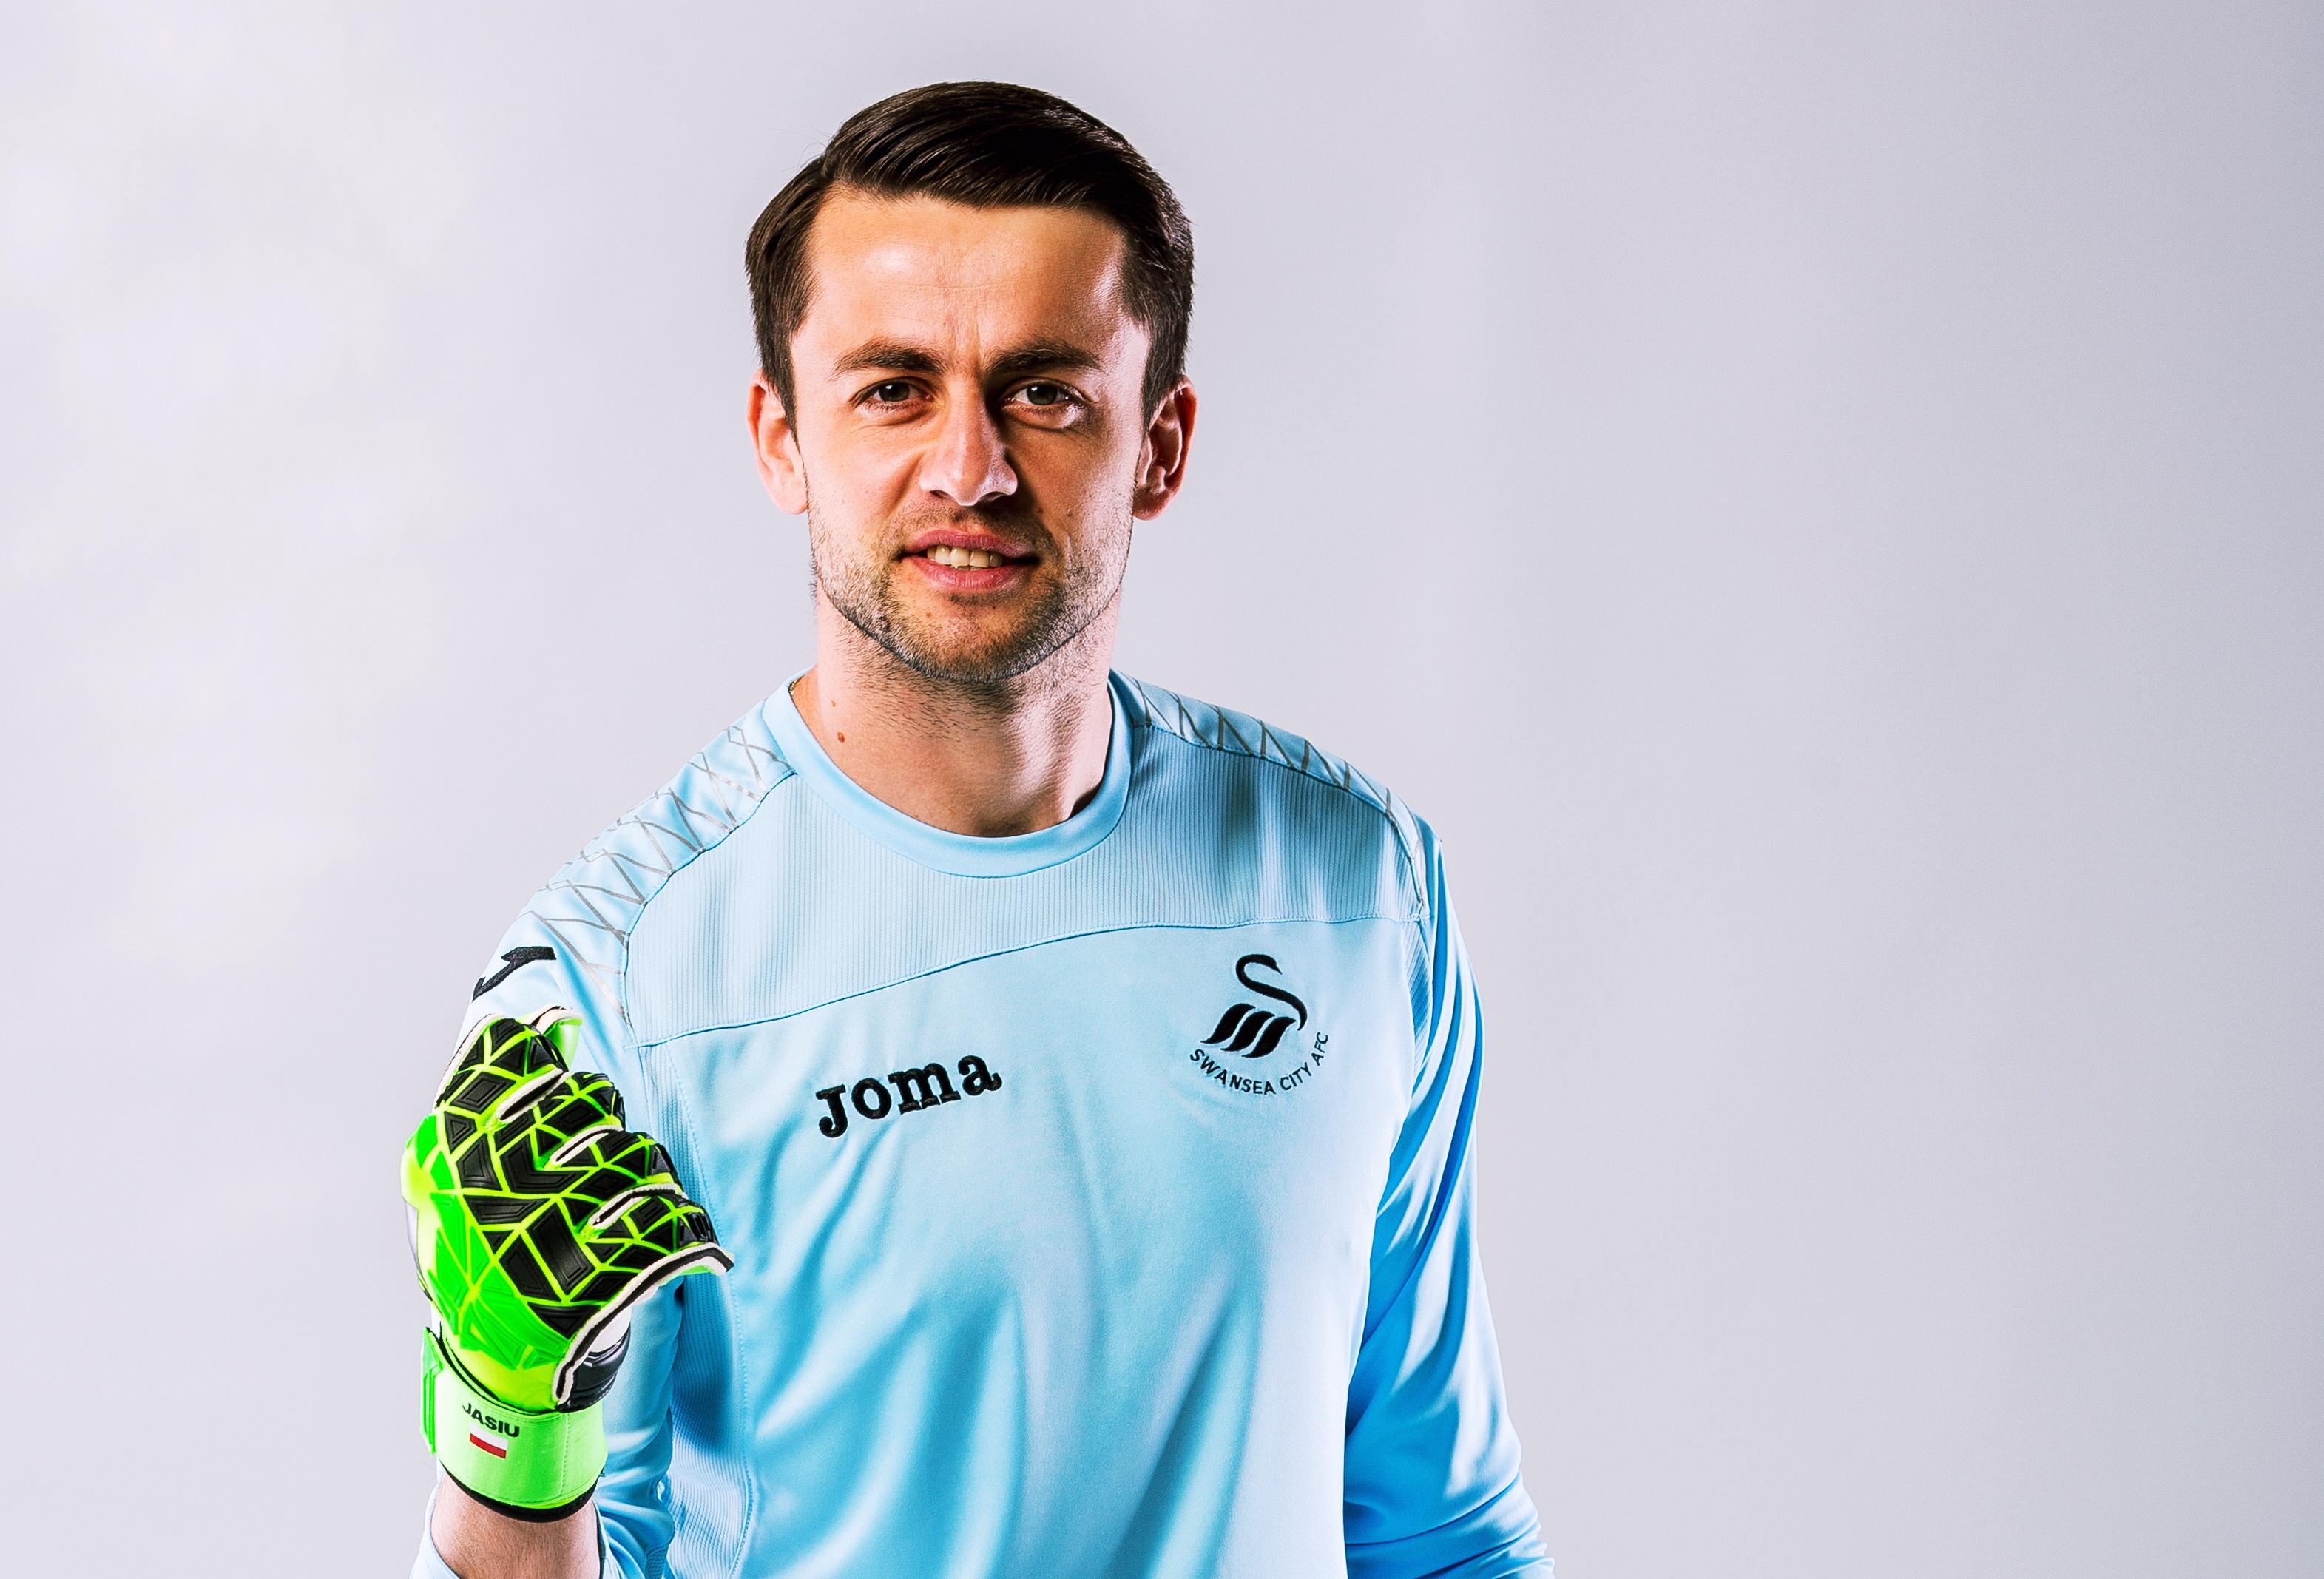 premium selection 84bb5 bb1bf Swansea City Home and Away Kit for the Season 2017-2018 ...